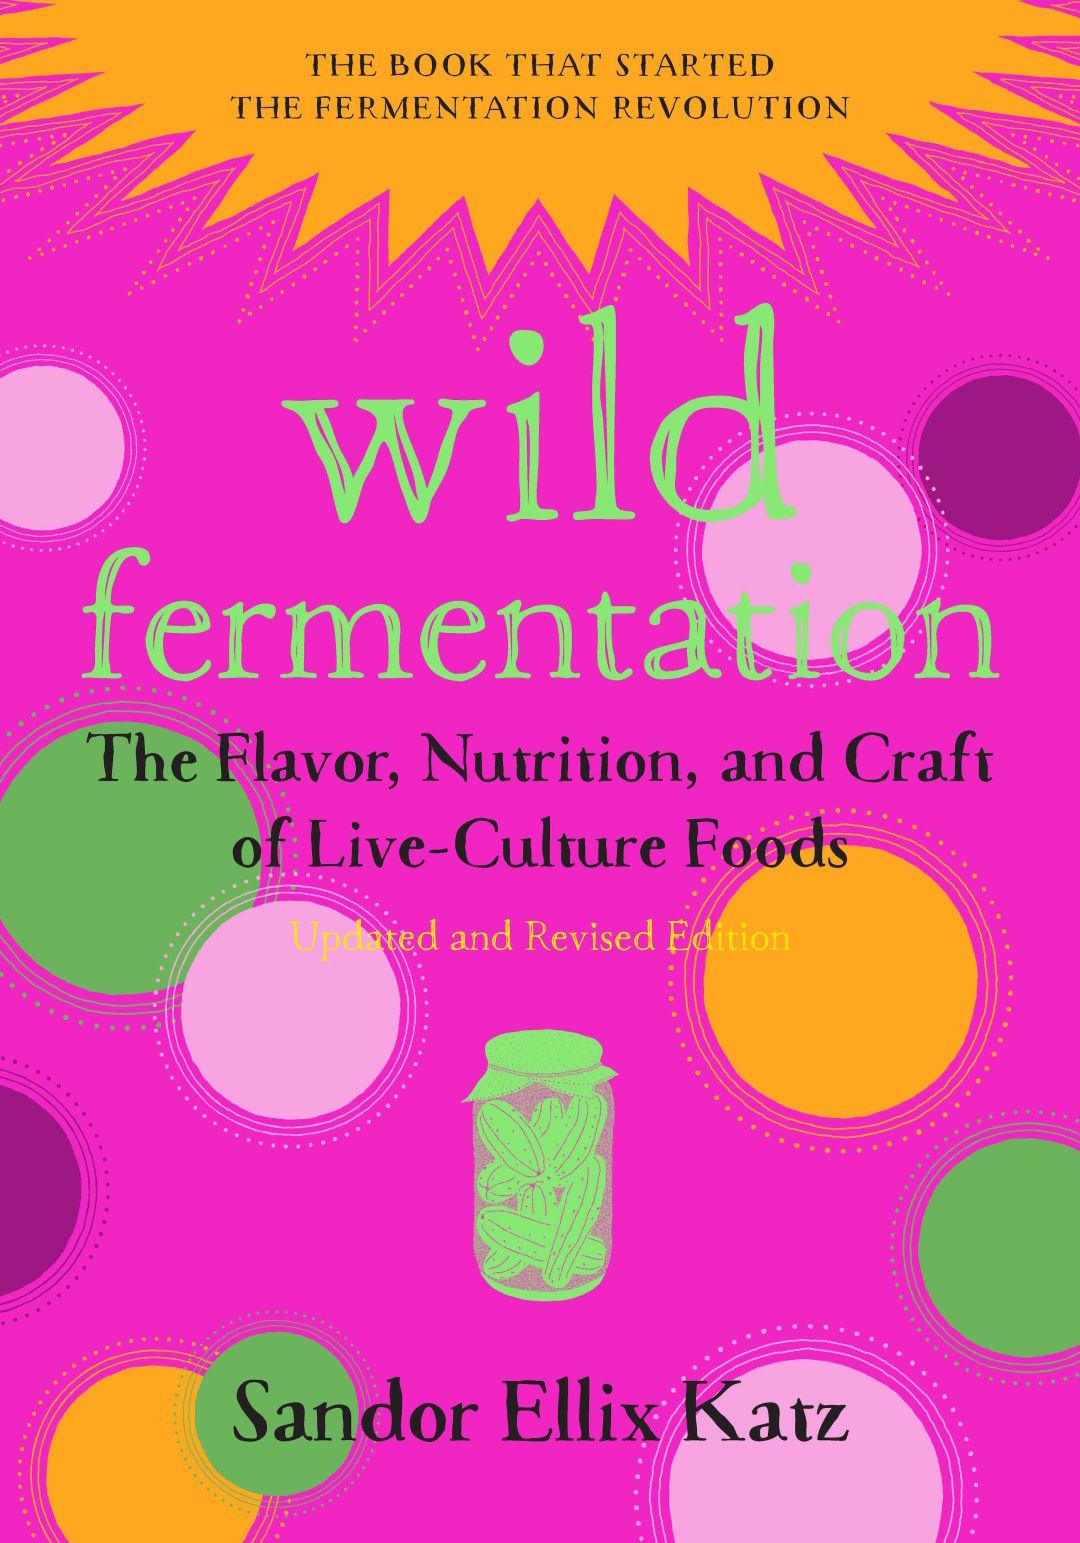 Wildfermentation2nd frontcover elpiw4